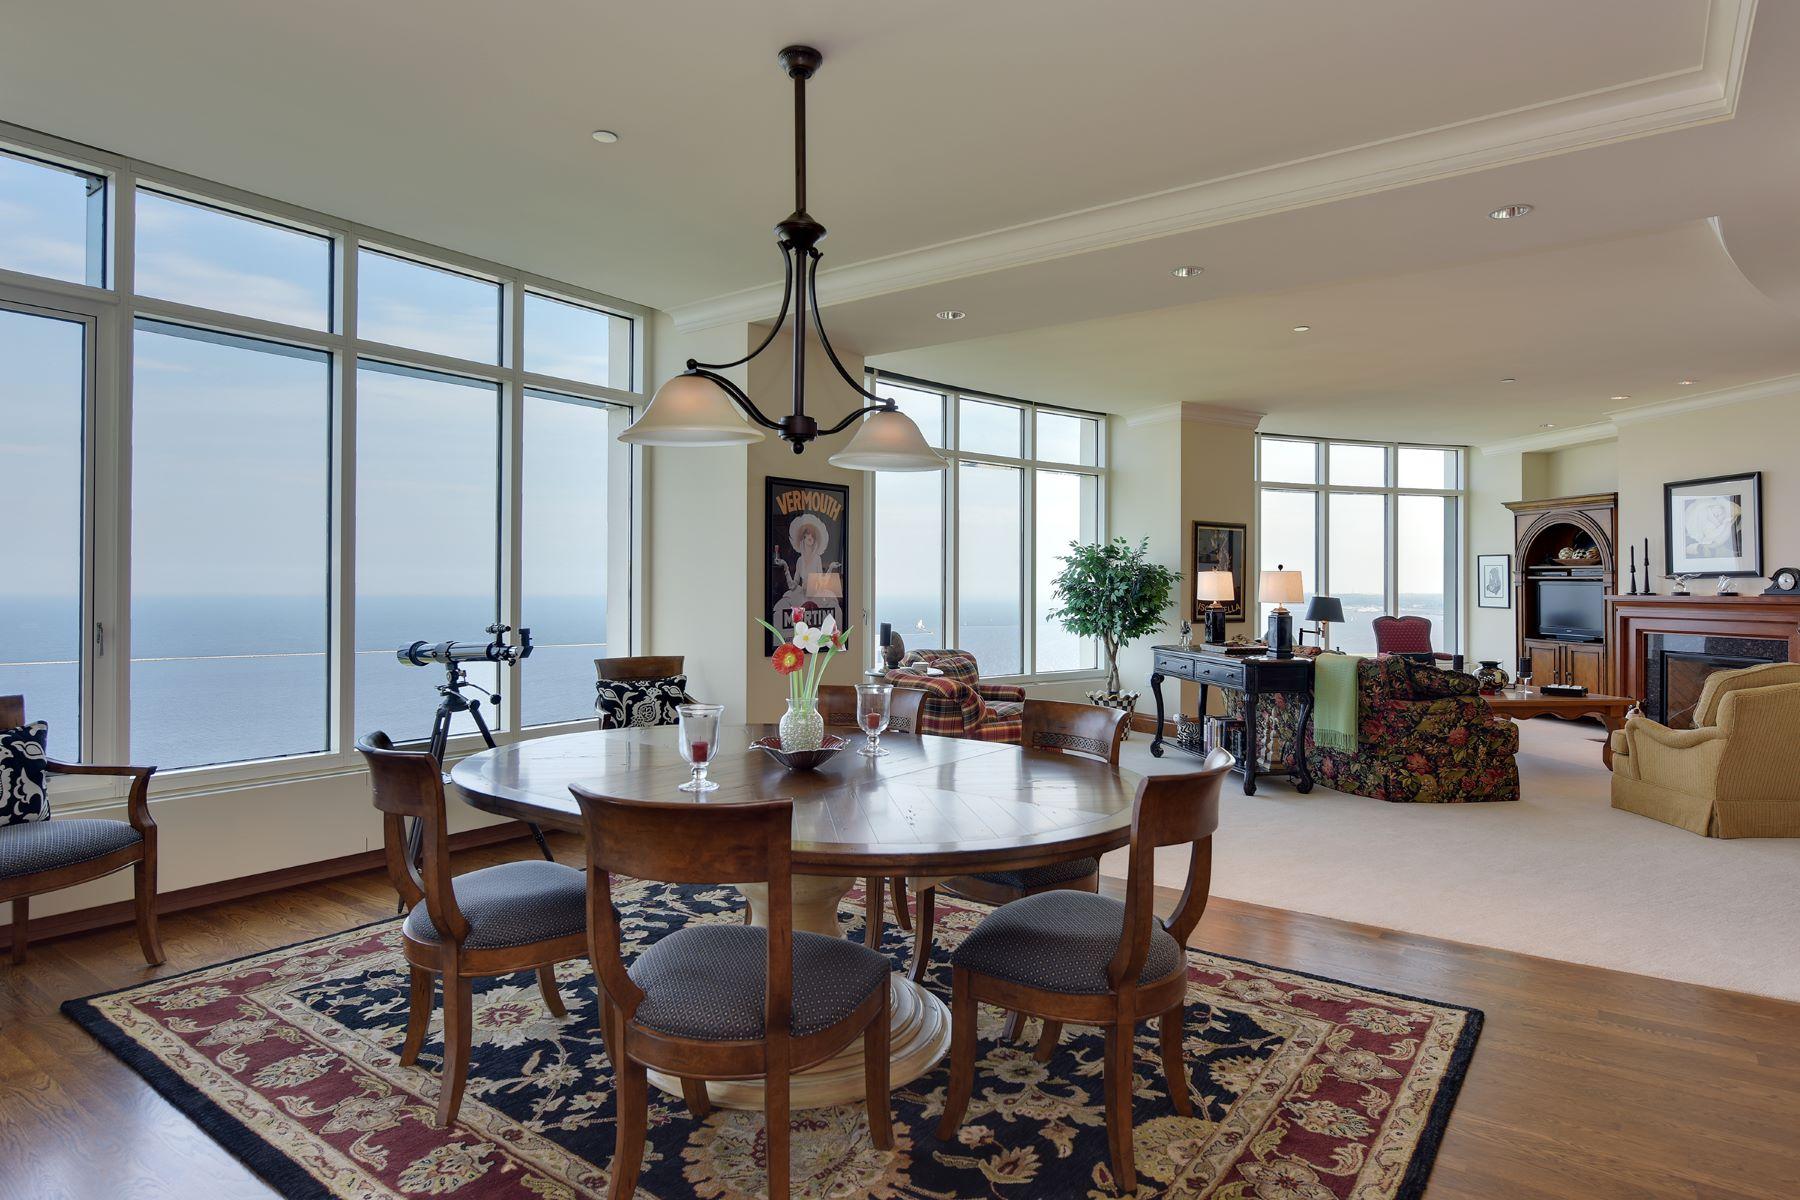 Condominiums для того Продажа на University Club Tower 825 N. Prospect Ave. 2101, Milwaukee, Висконсин 53202 Соединенные Штаты